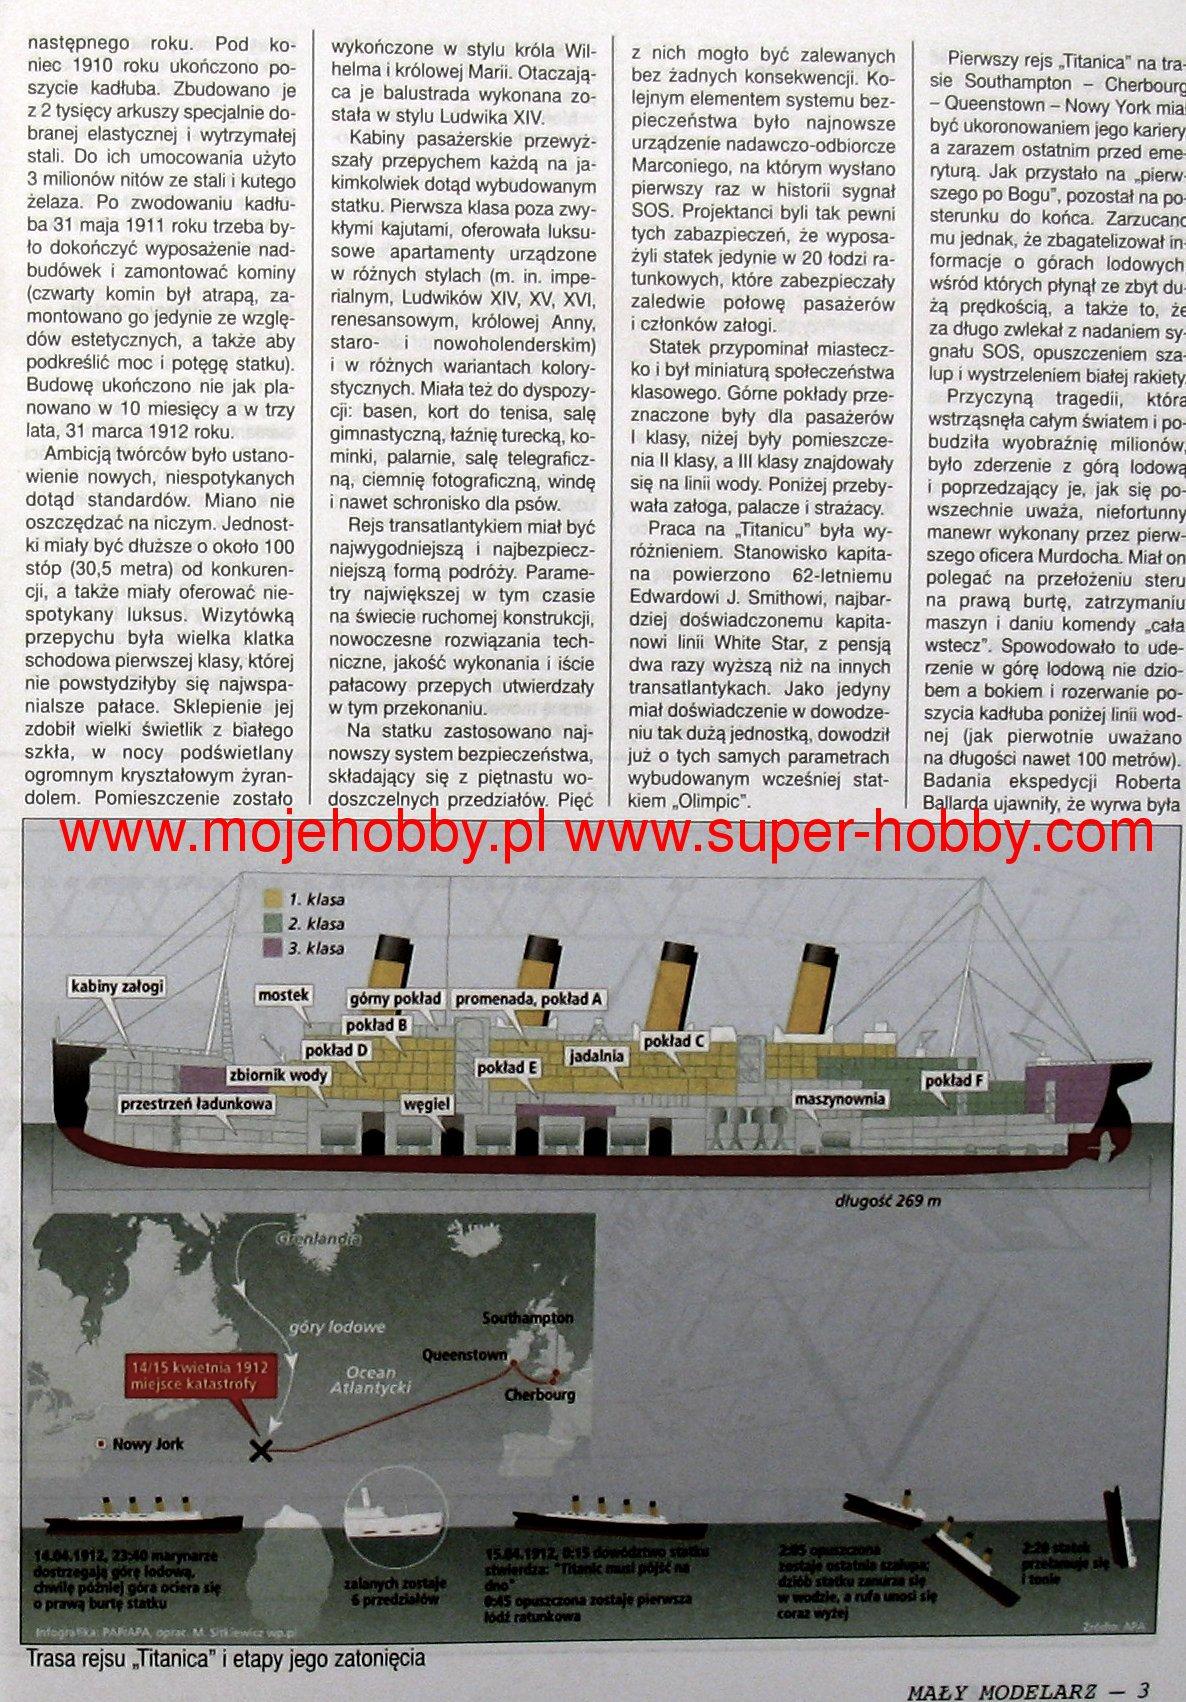 Transatlantyk Rms Titanic Czesc 1 Maly Modelarz 10 11 12 2010